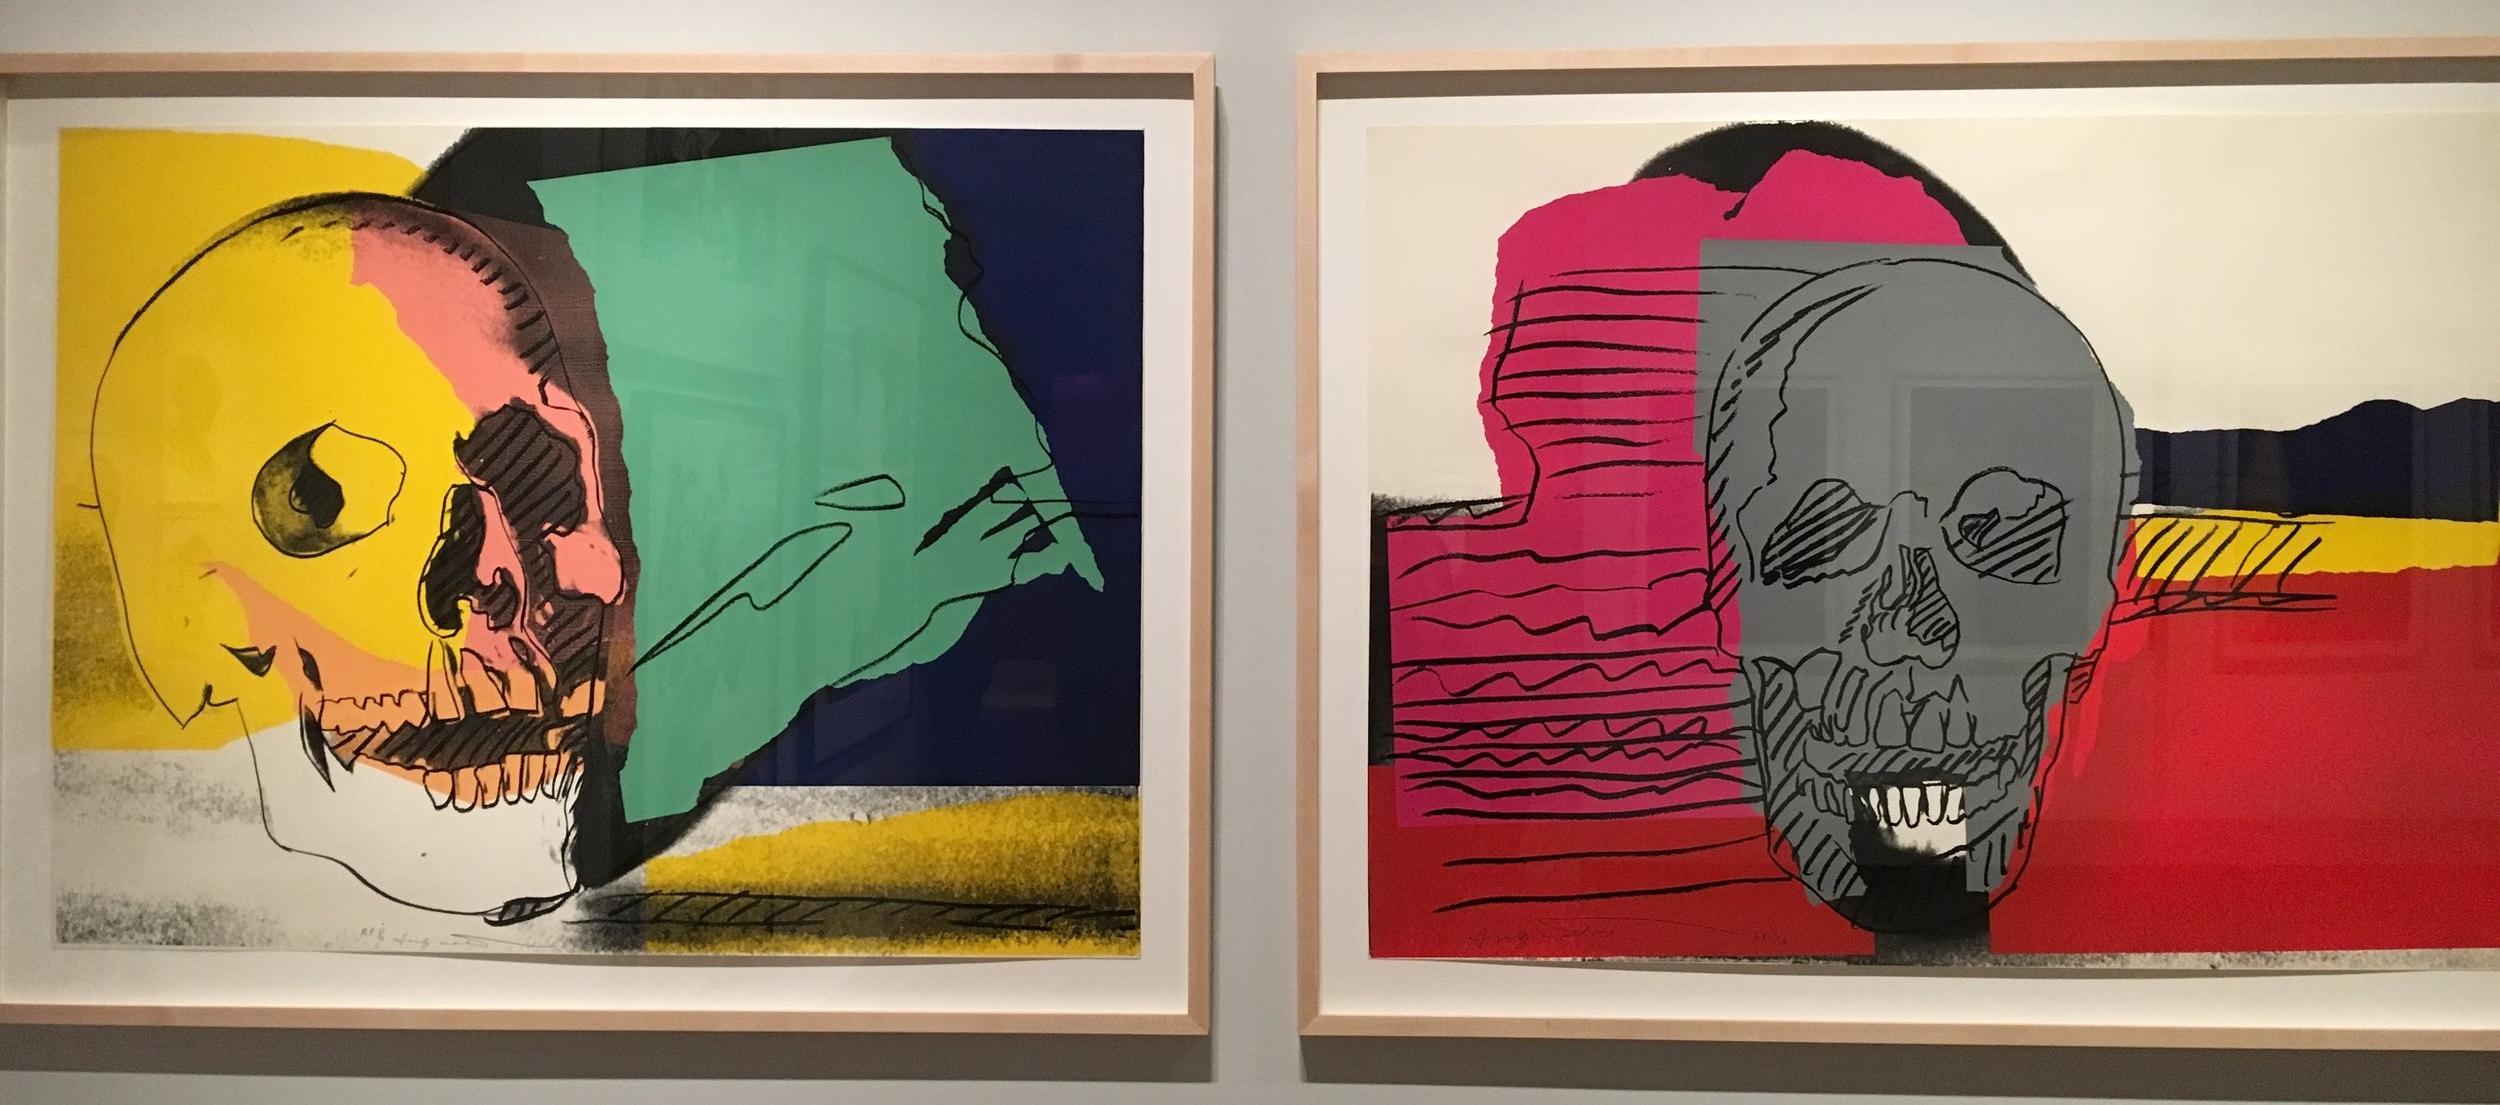 Skulls_Andy-Warhol_Portland-Art-Museum